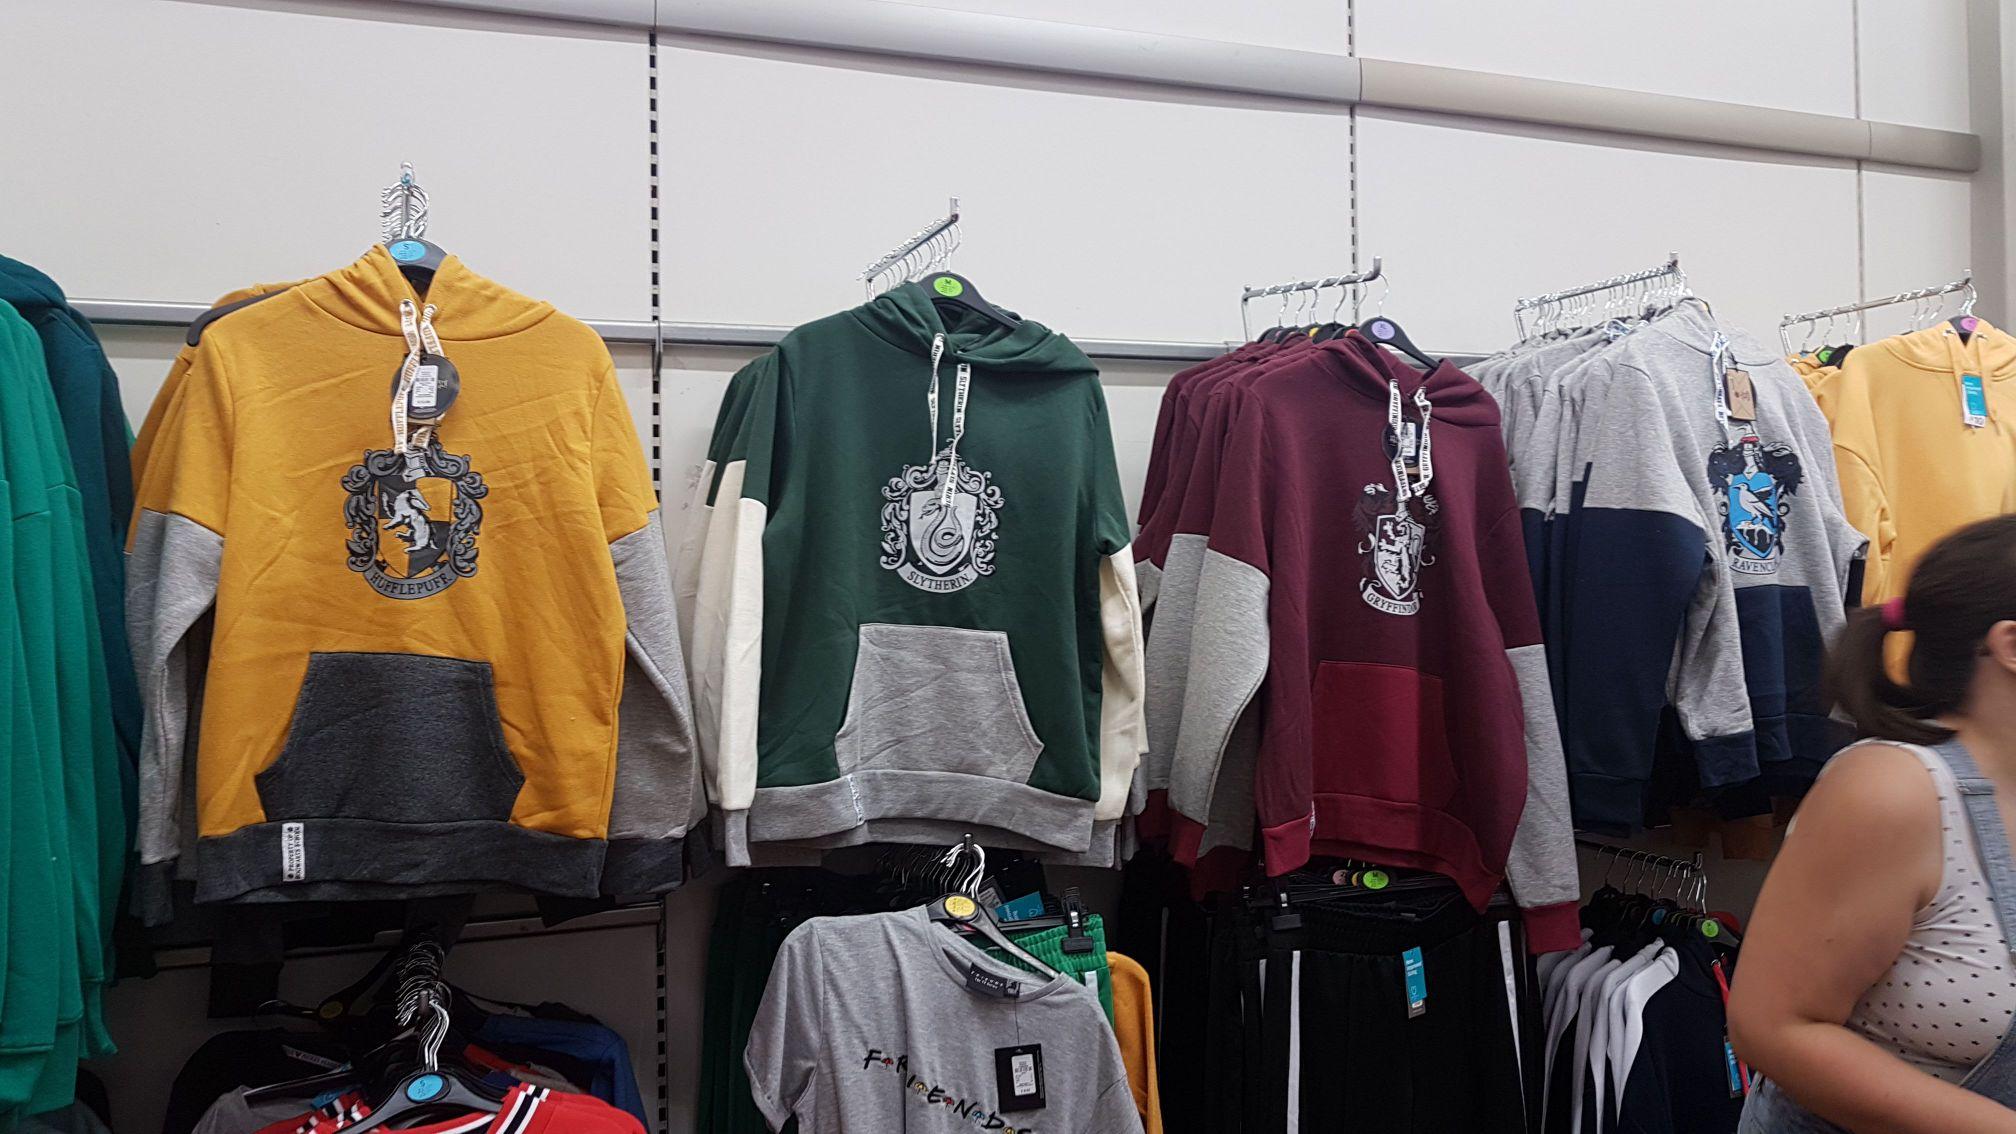 b5bf8ab78 Harry Potter house hoodies @ Primark – £12 - Primark | AceDealClub